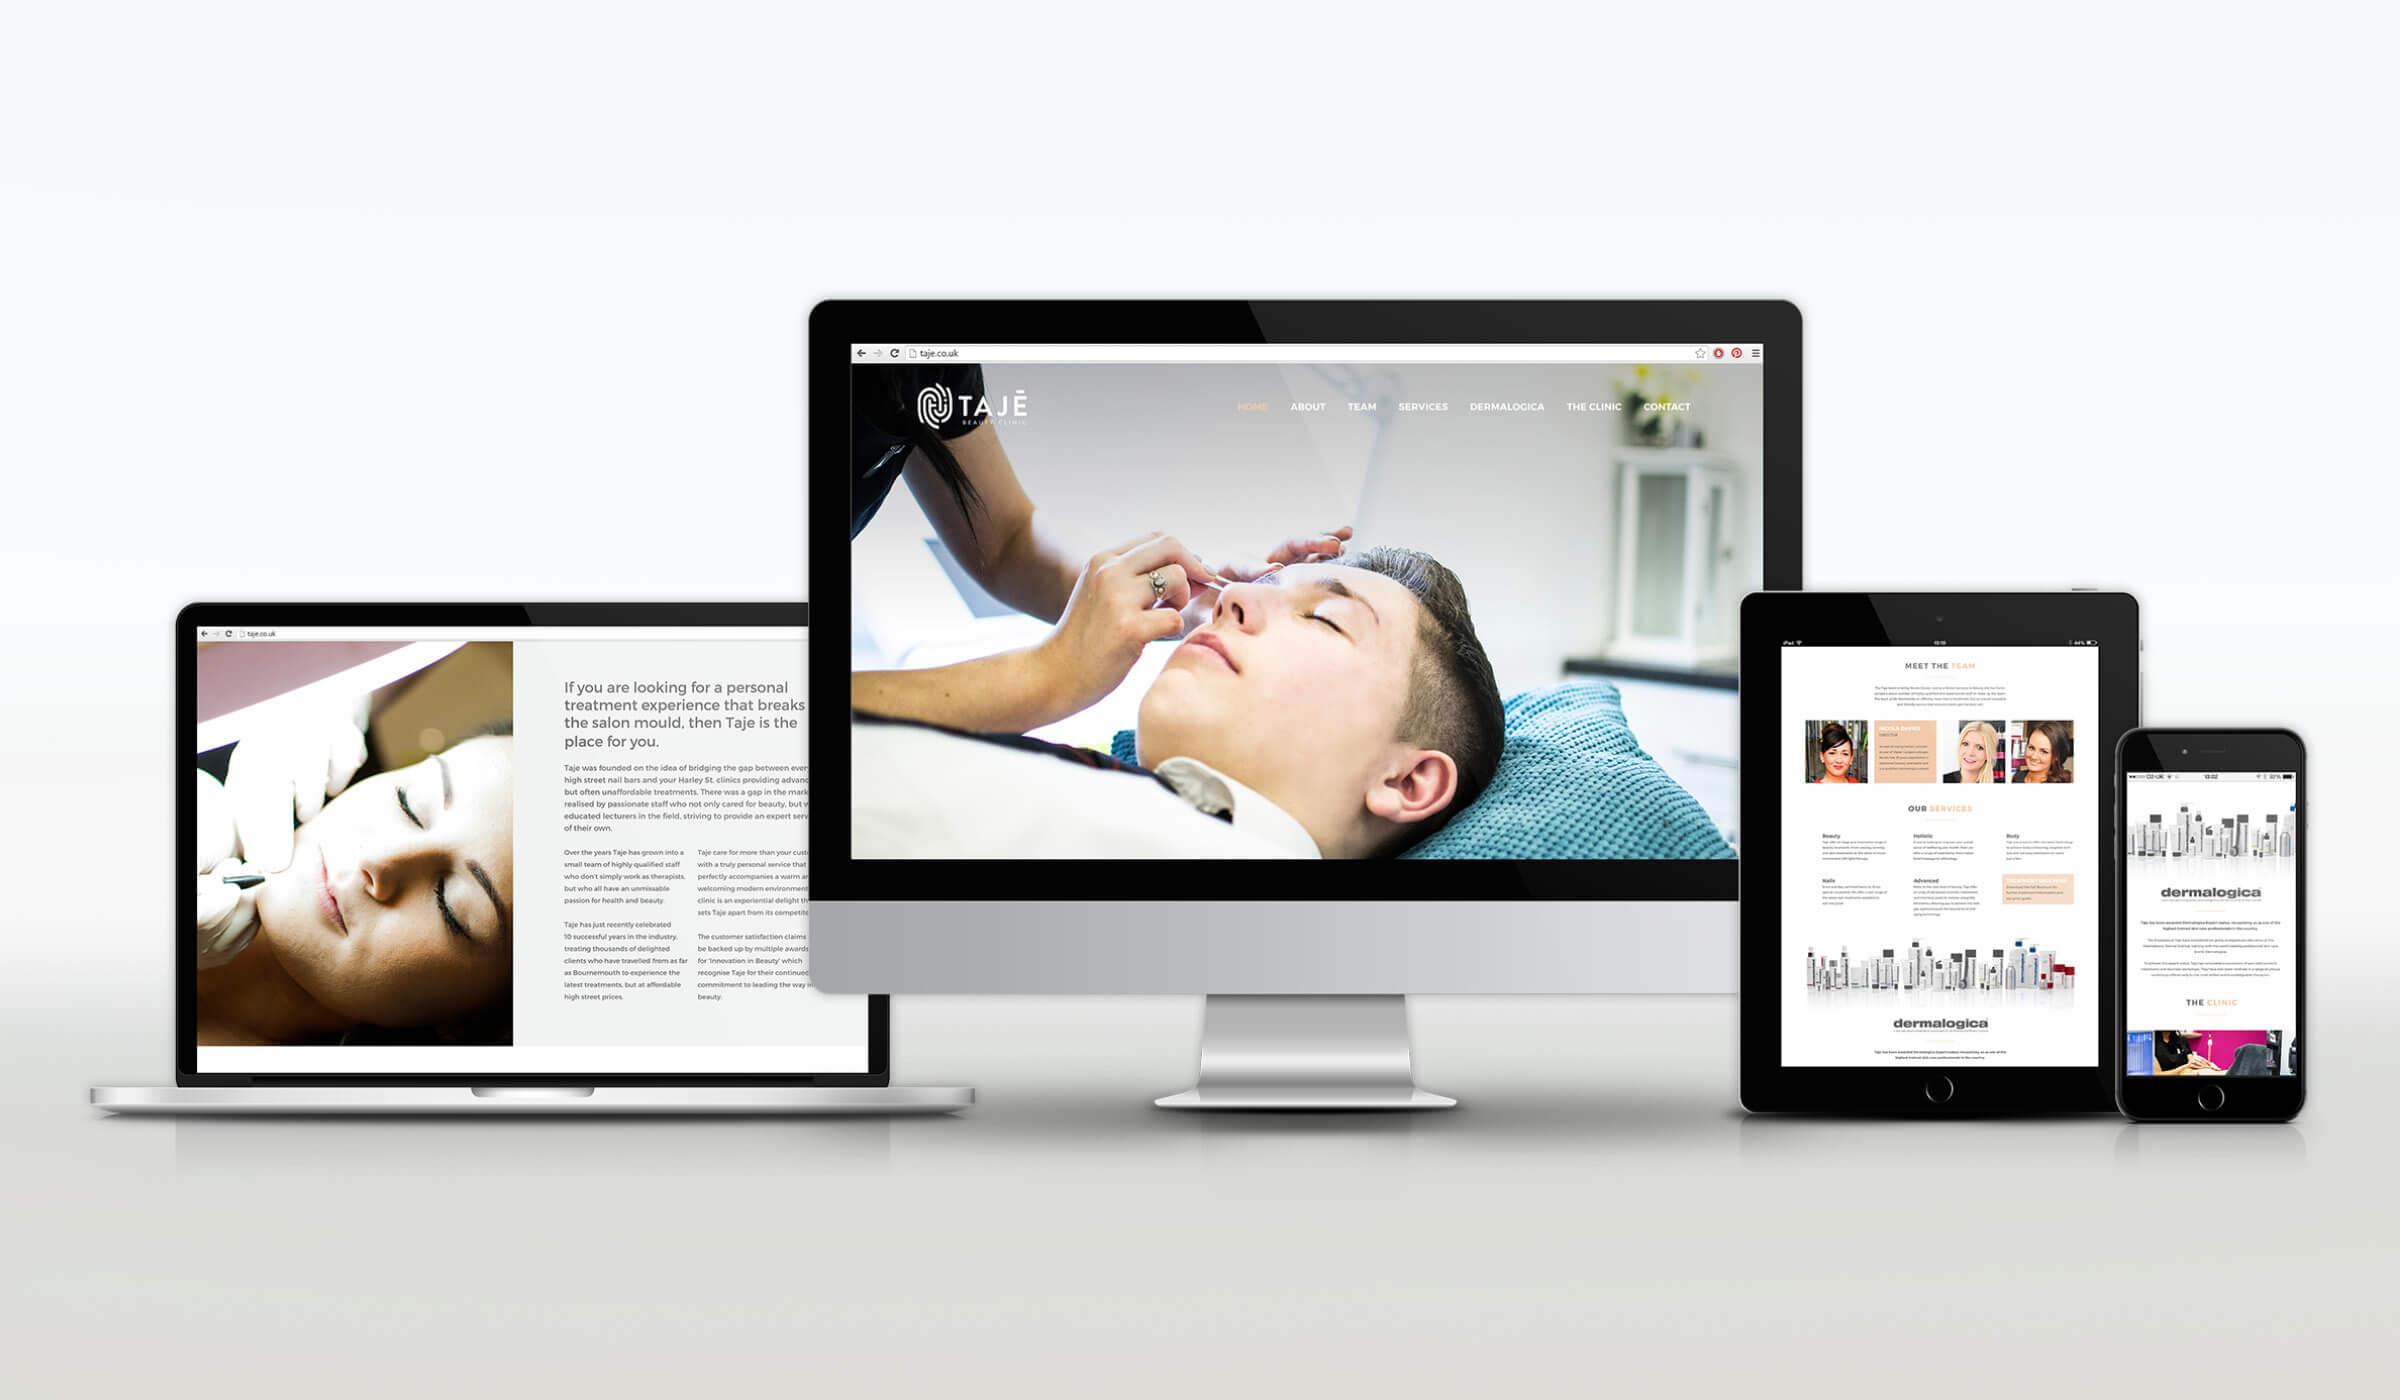 responsive website design for beauty salon